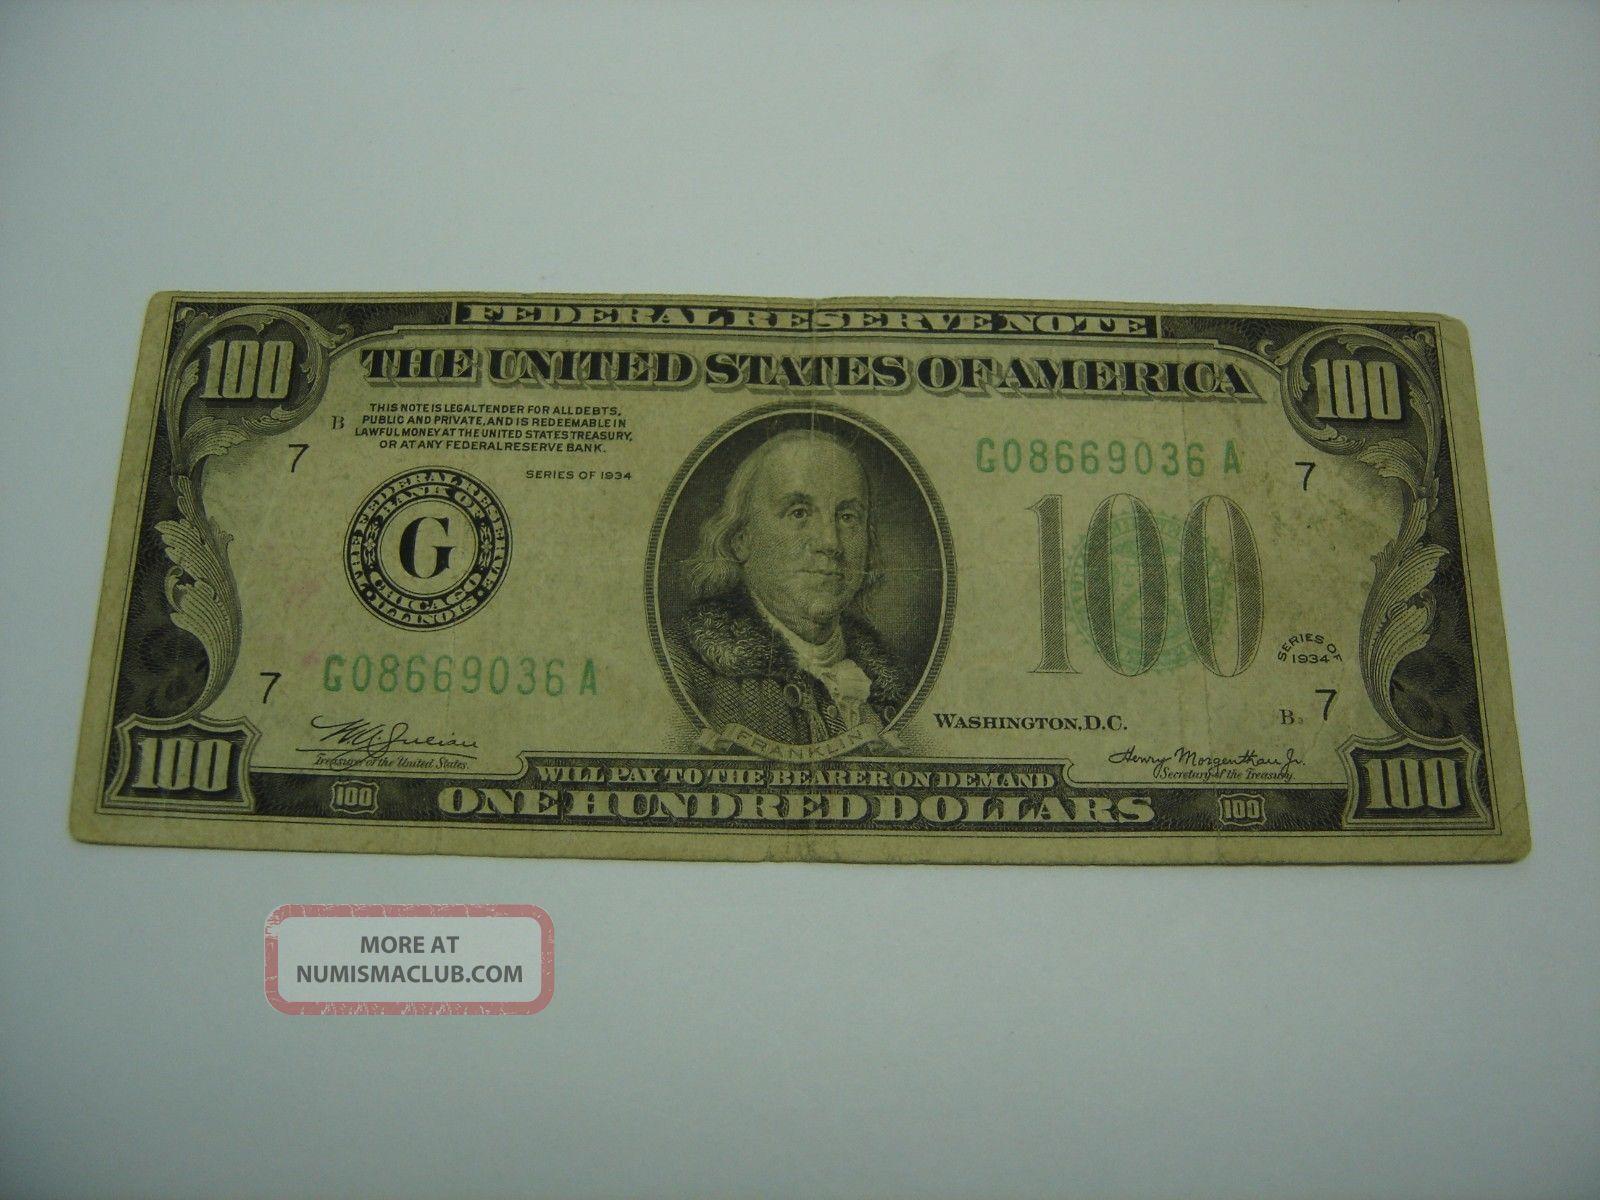 Us $100 - One Hundred Dollar Bill Note Cash Money 1934 B